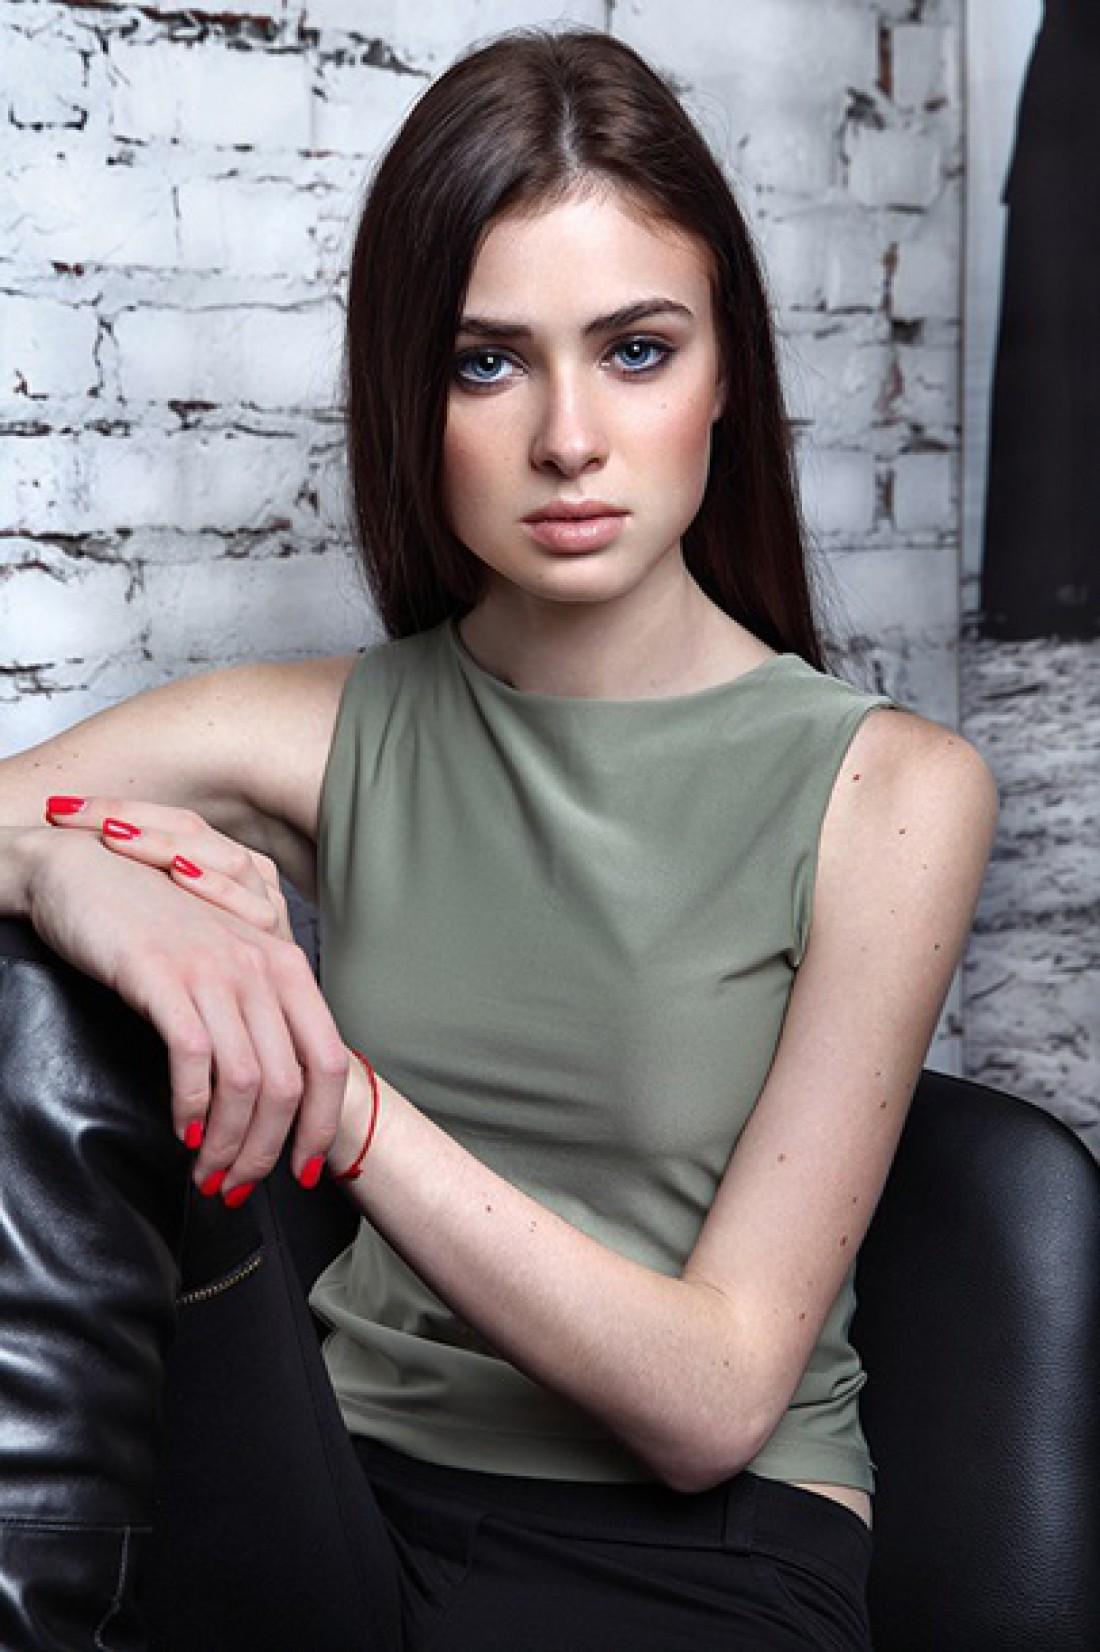 Кристина Столока не попала в топ финалисток